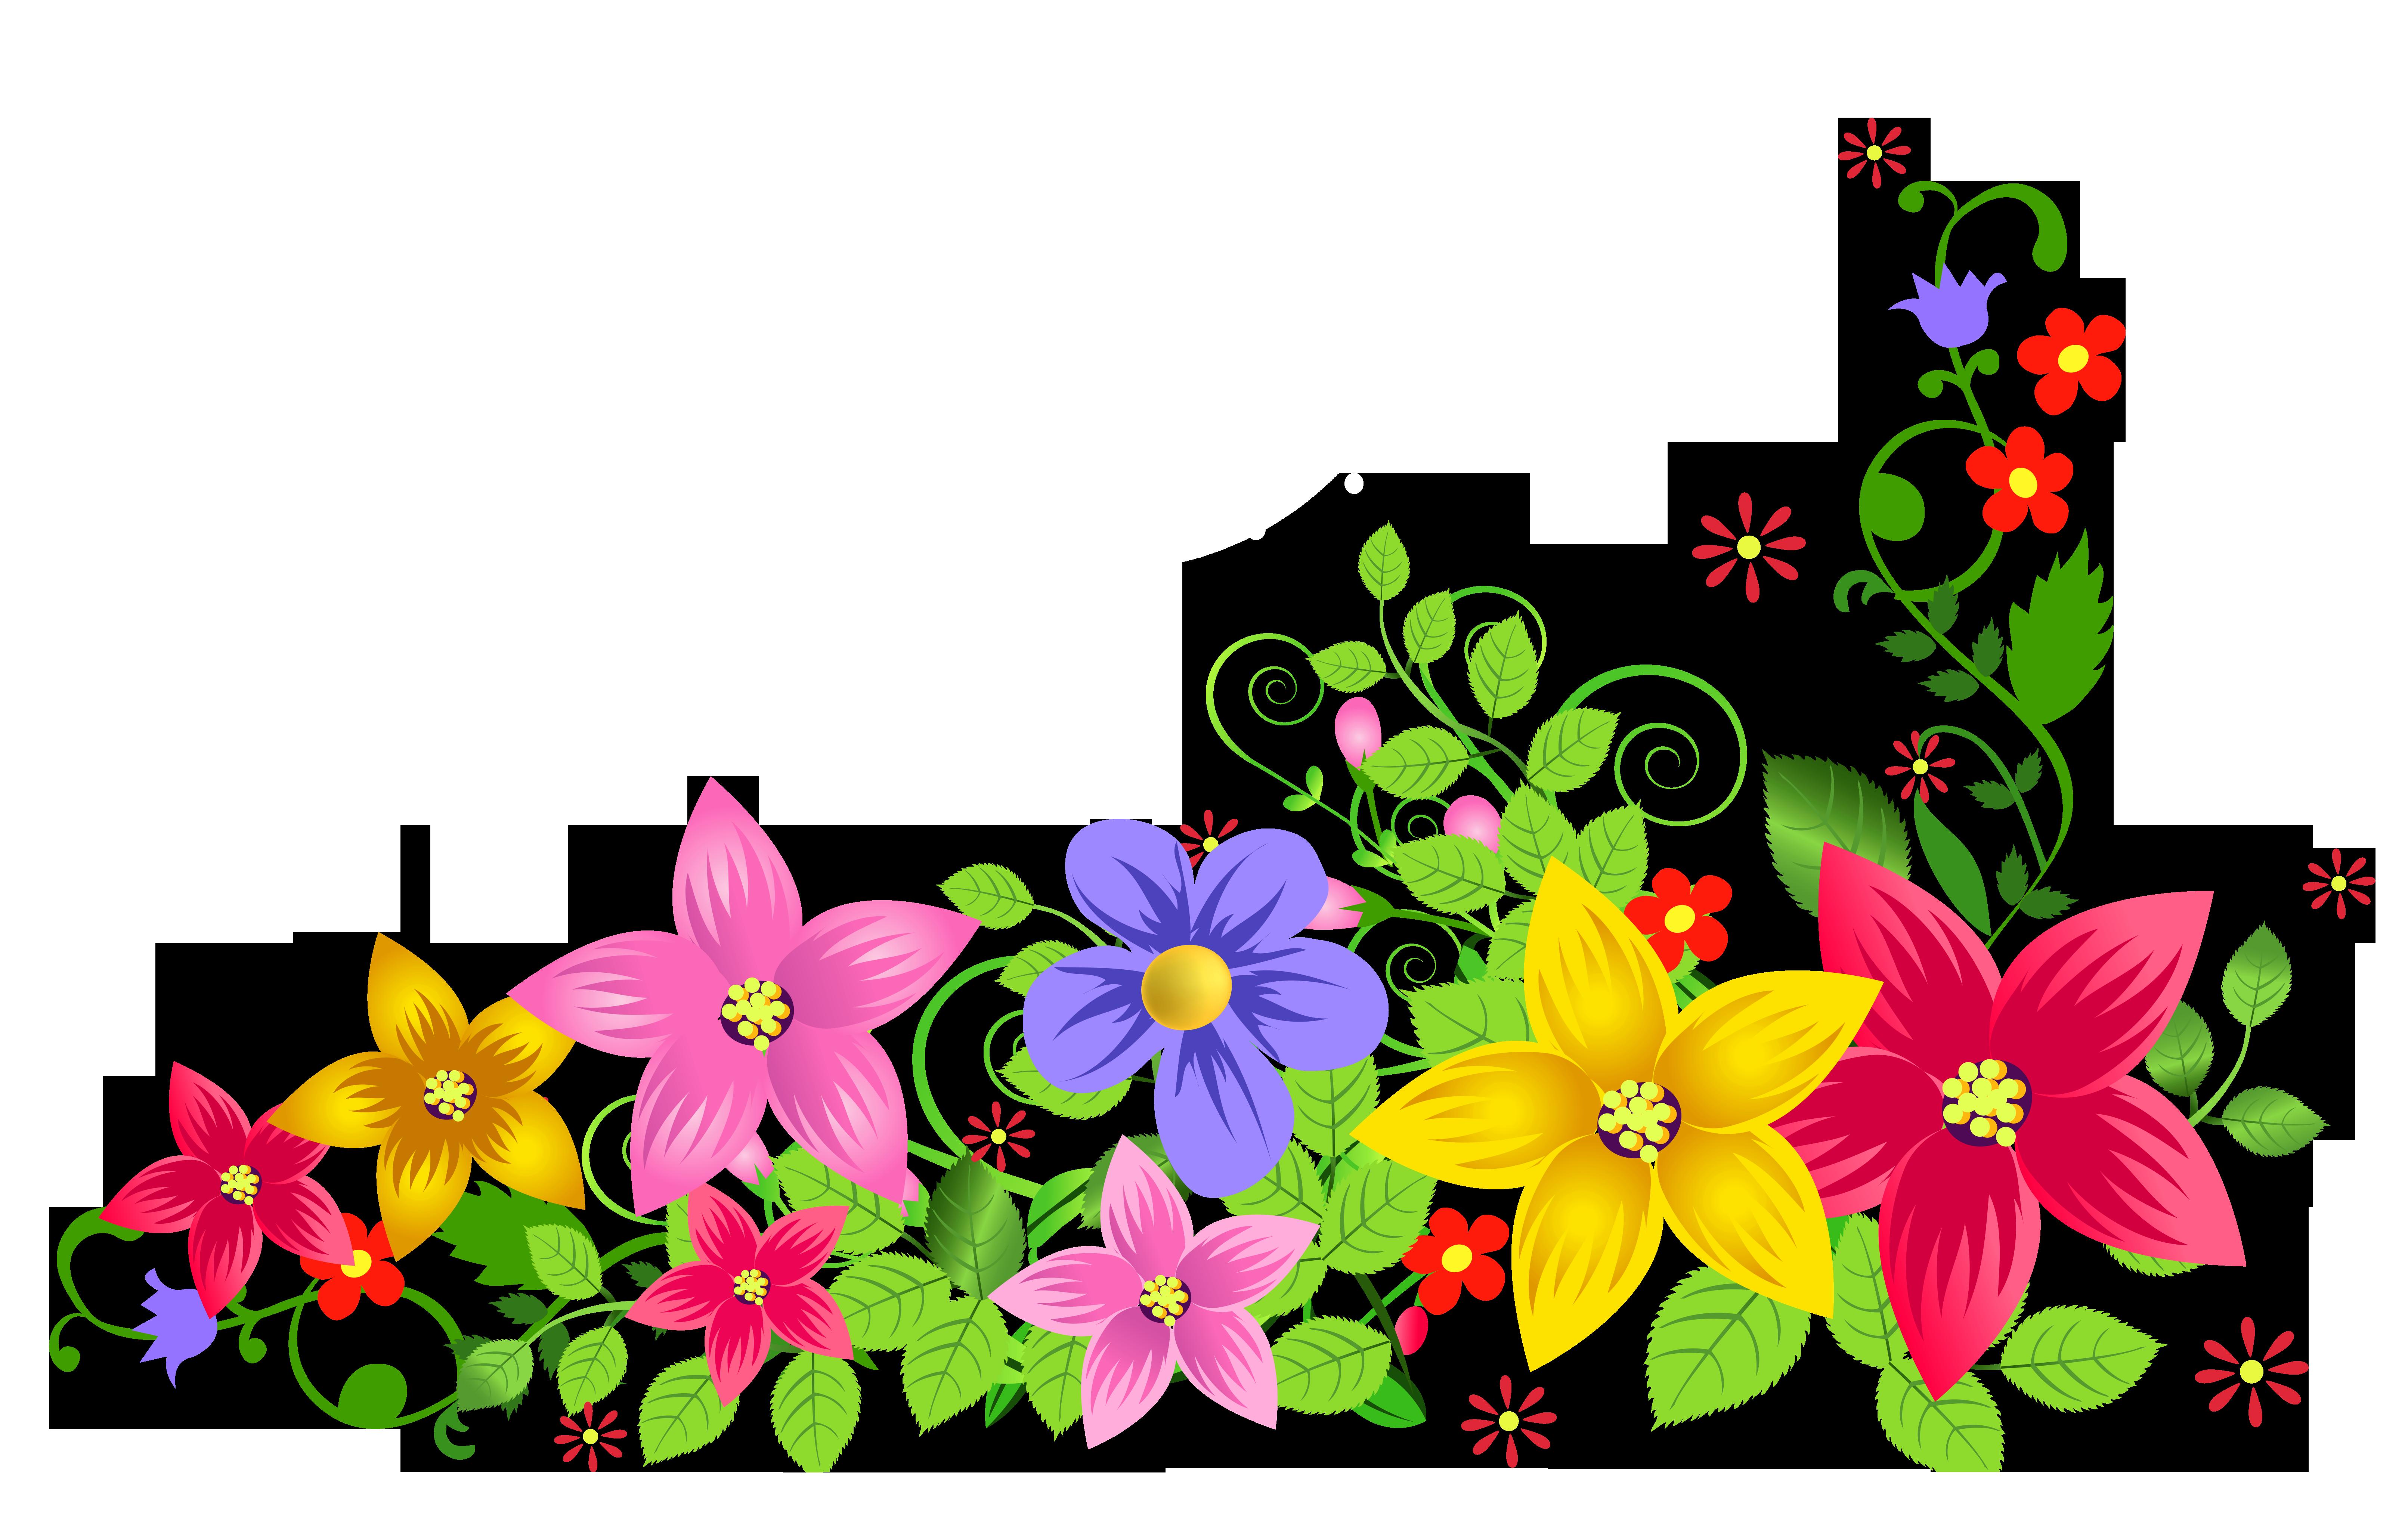 6446x4096 Transparent Floral Decoration PNG Pictureu200b Gallery Yopriceville